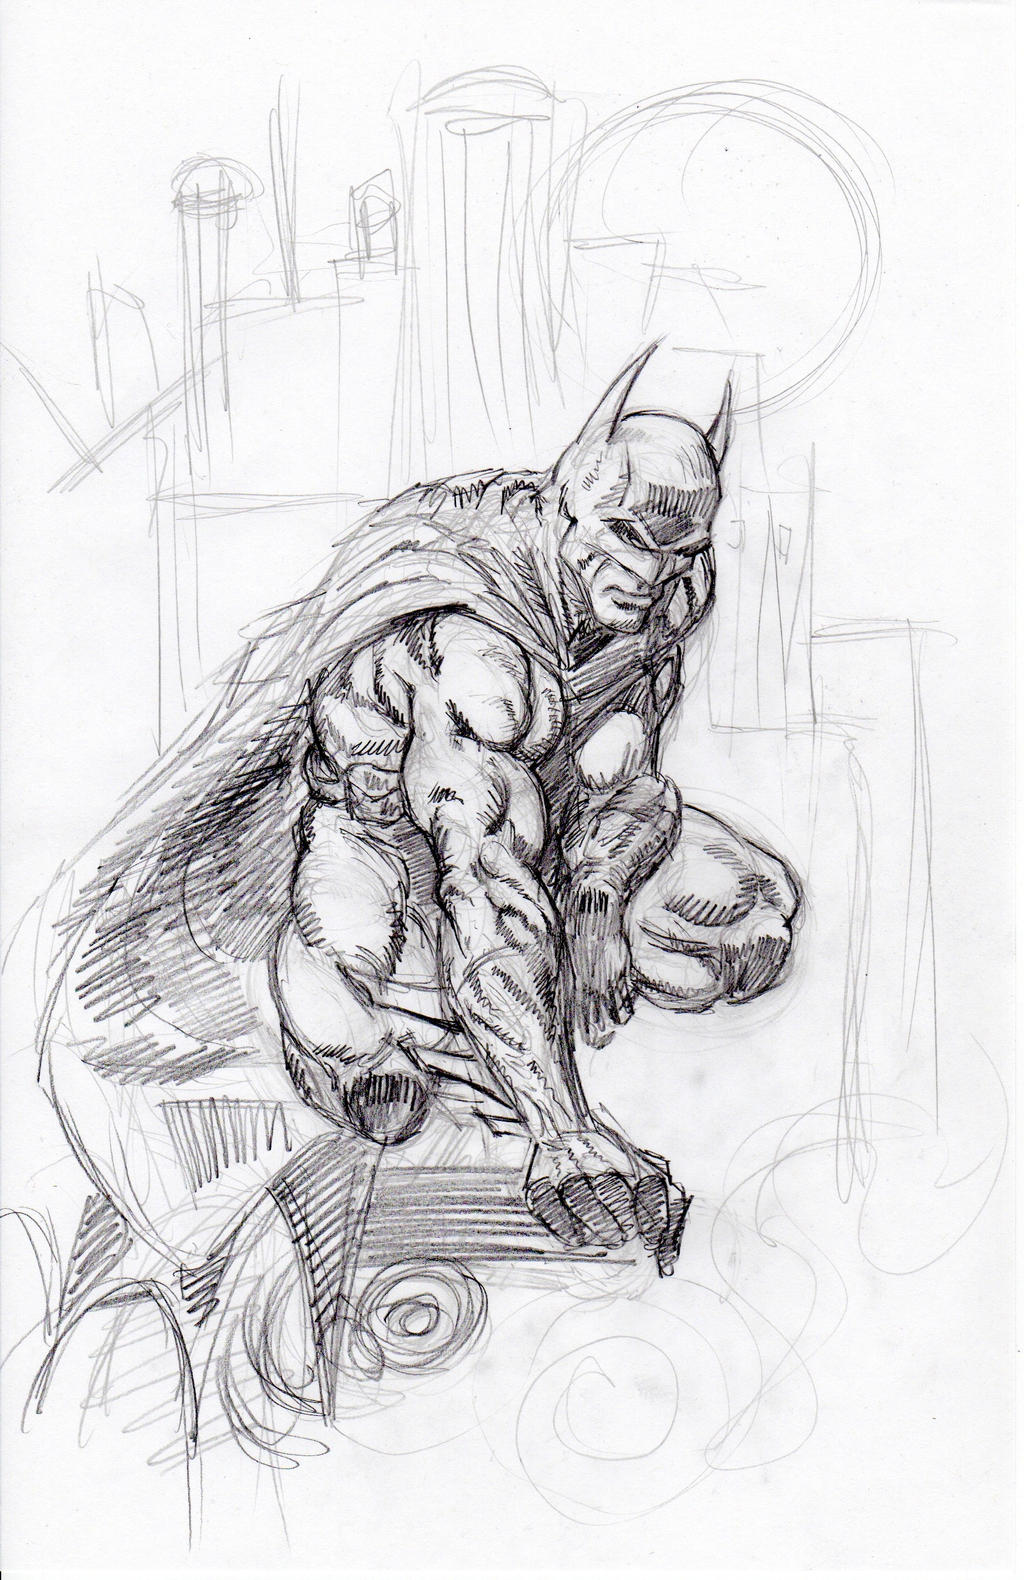 Finch Batman Sketch 11-26-2012